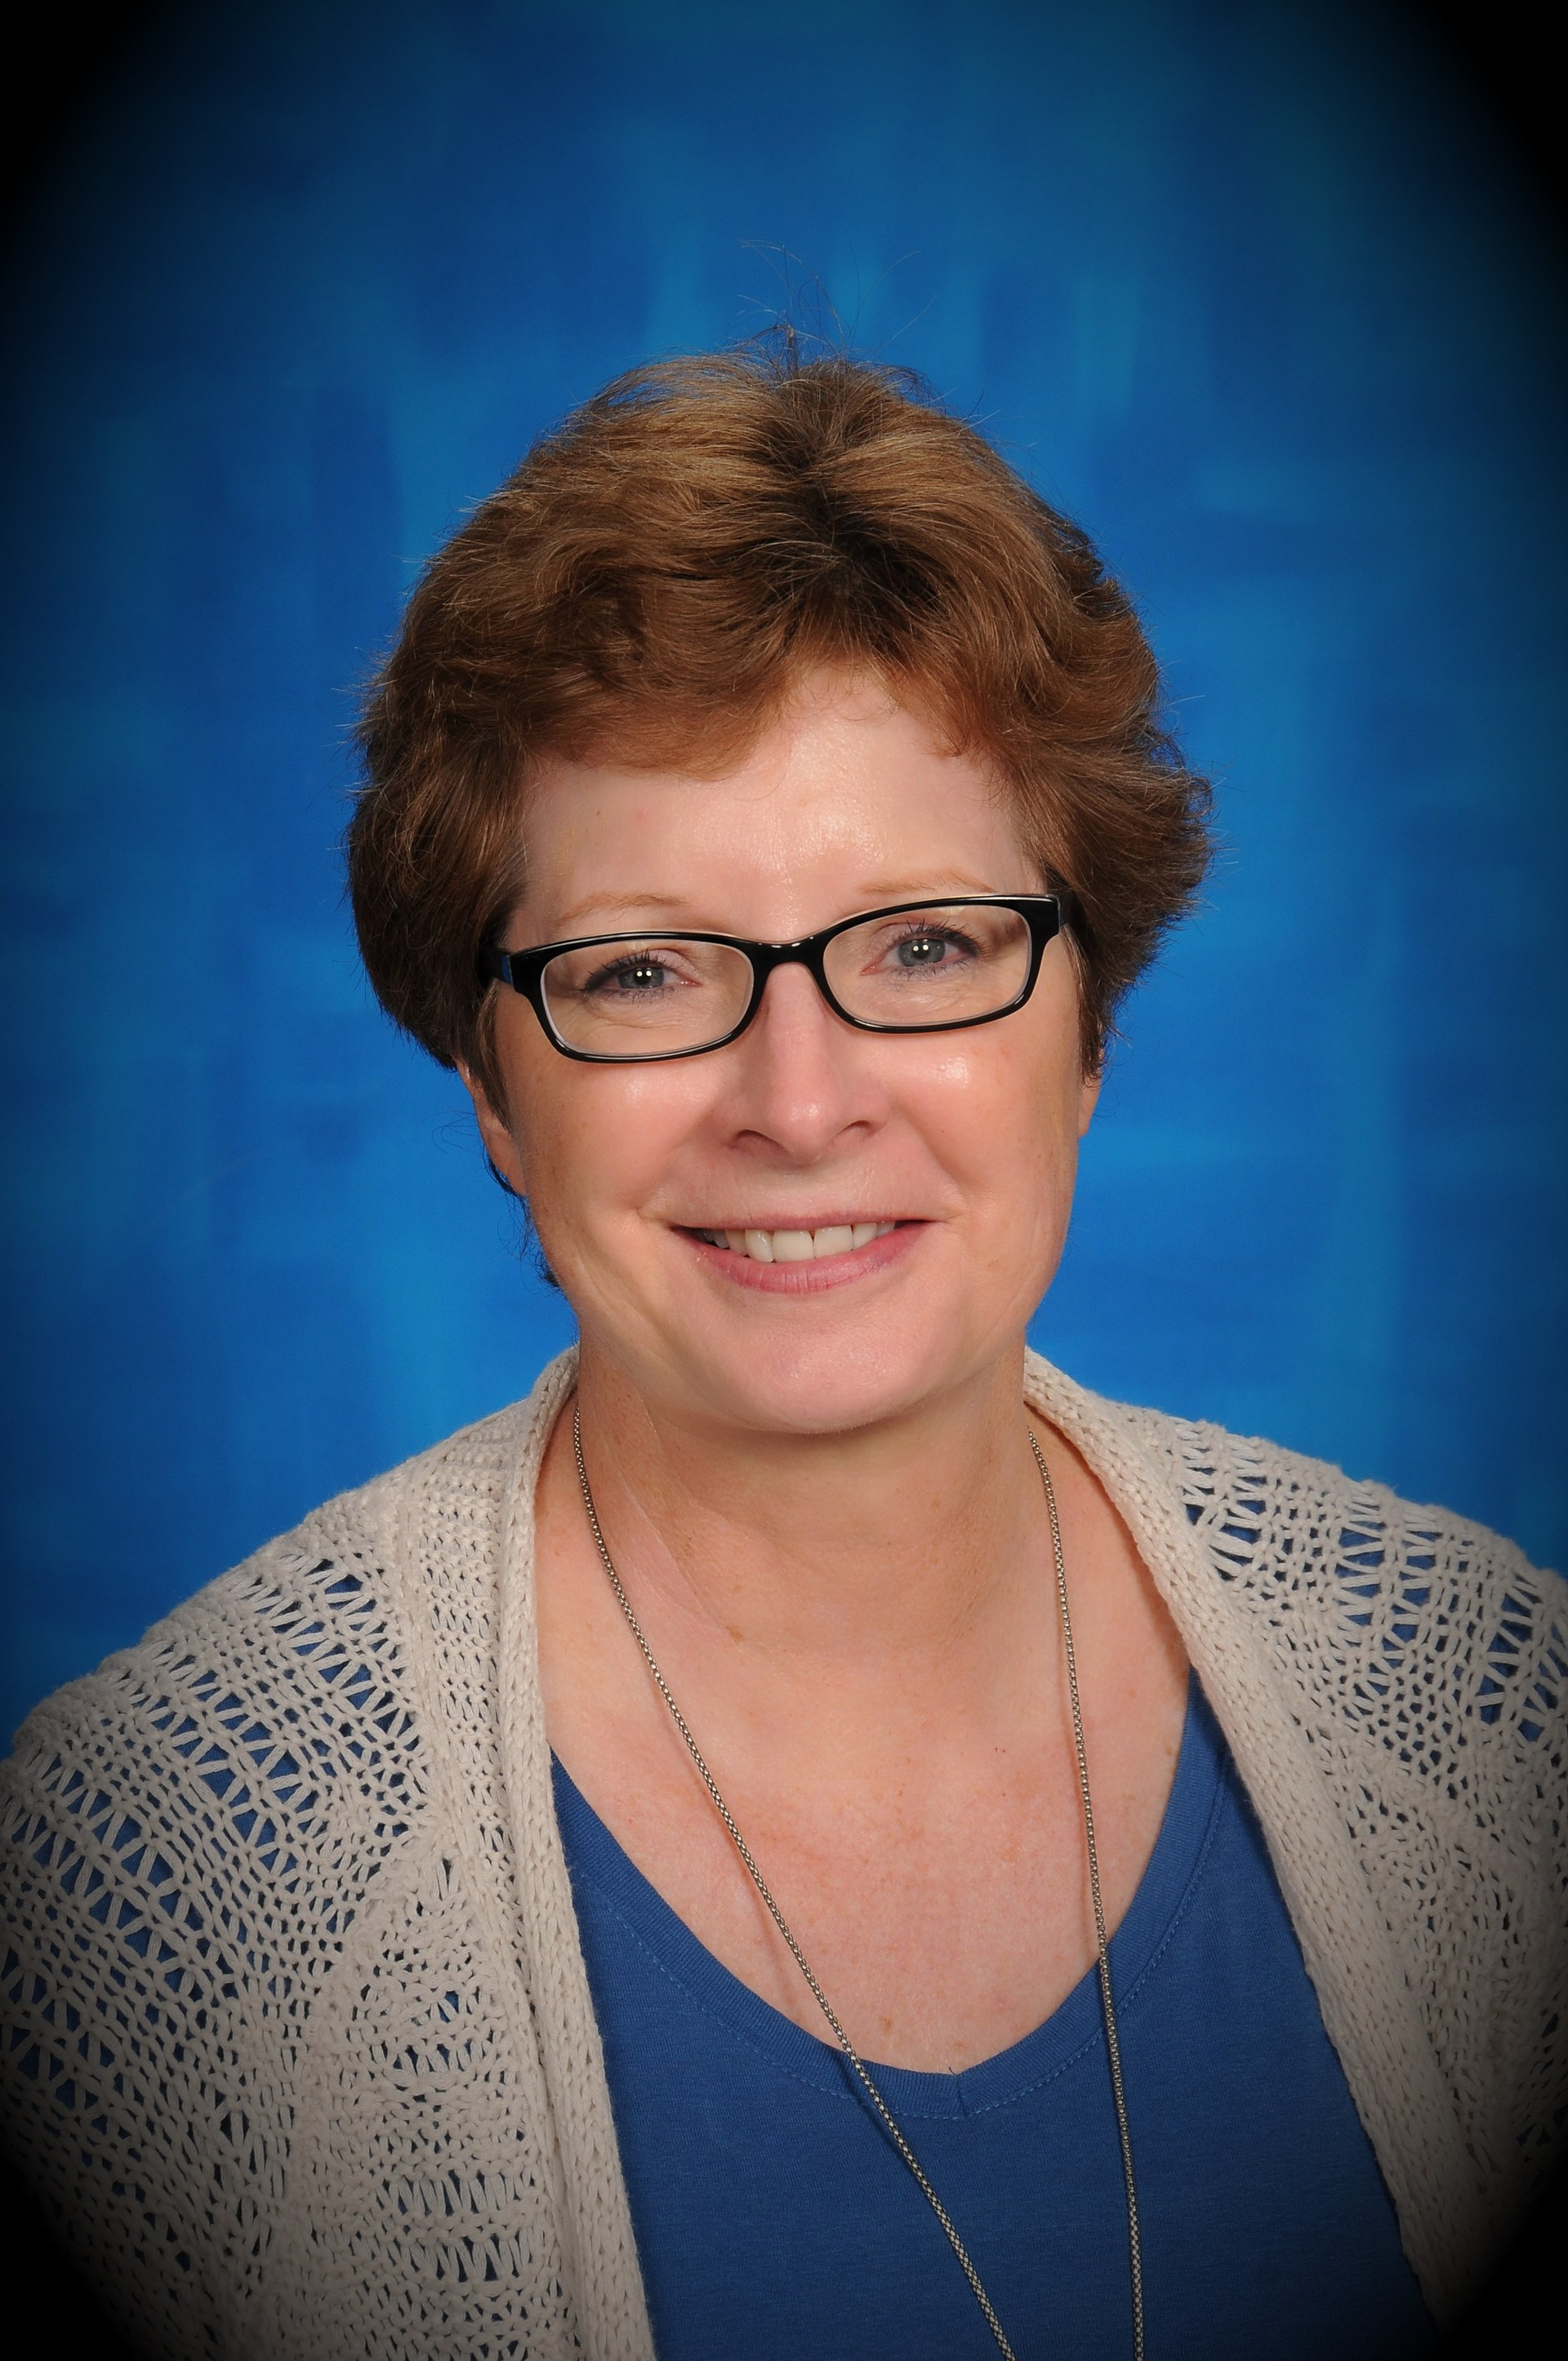 Principal Kelly Frederick